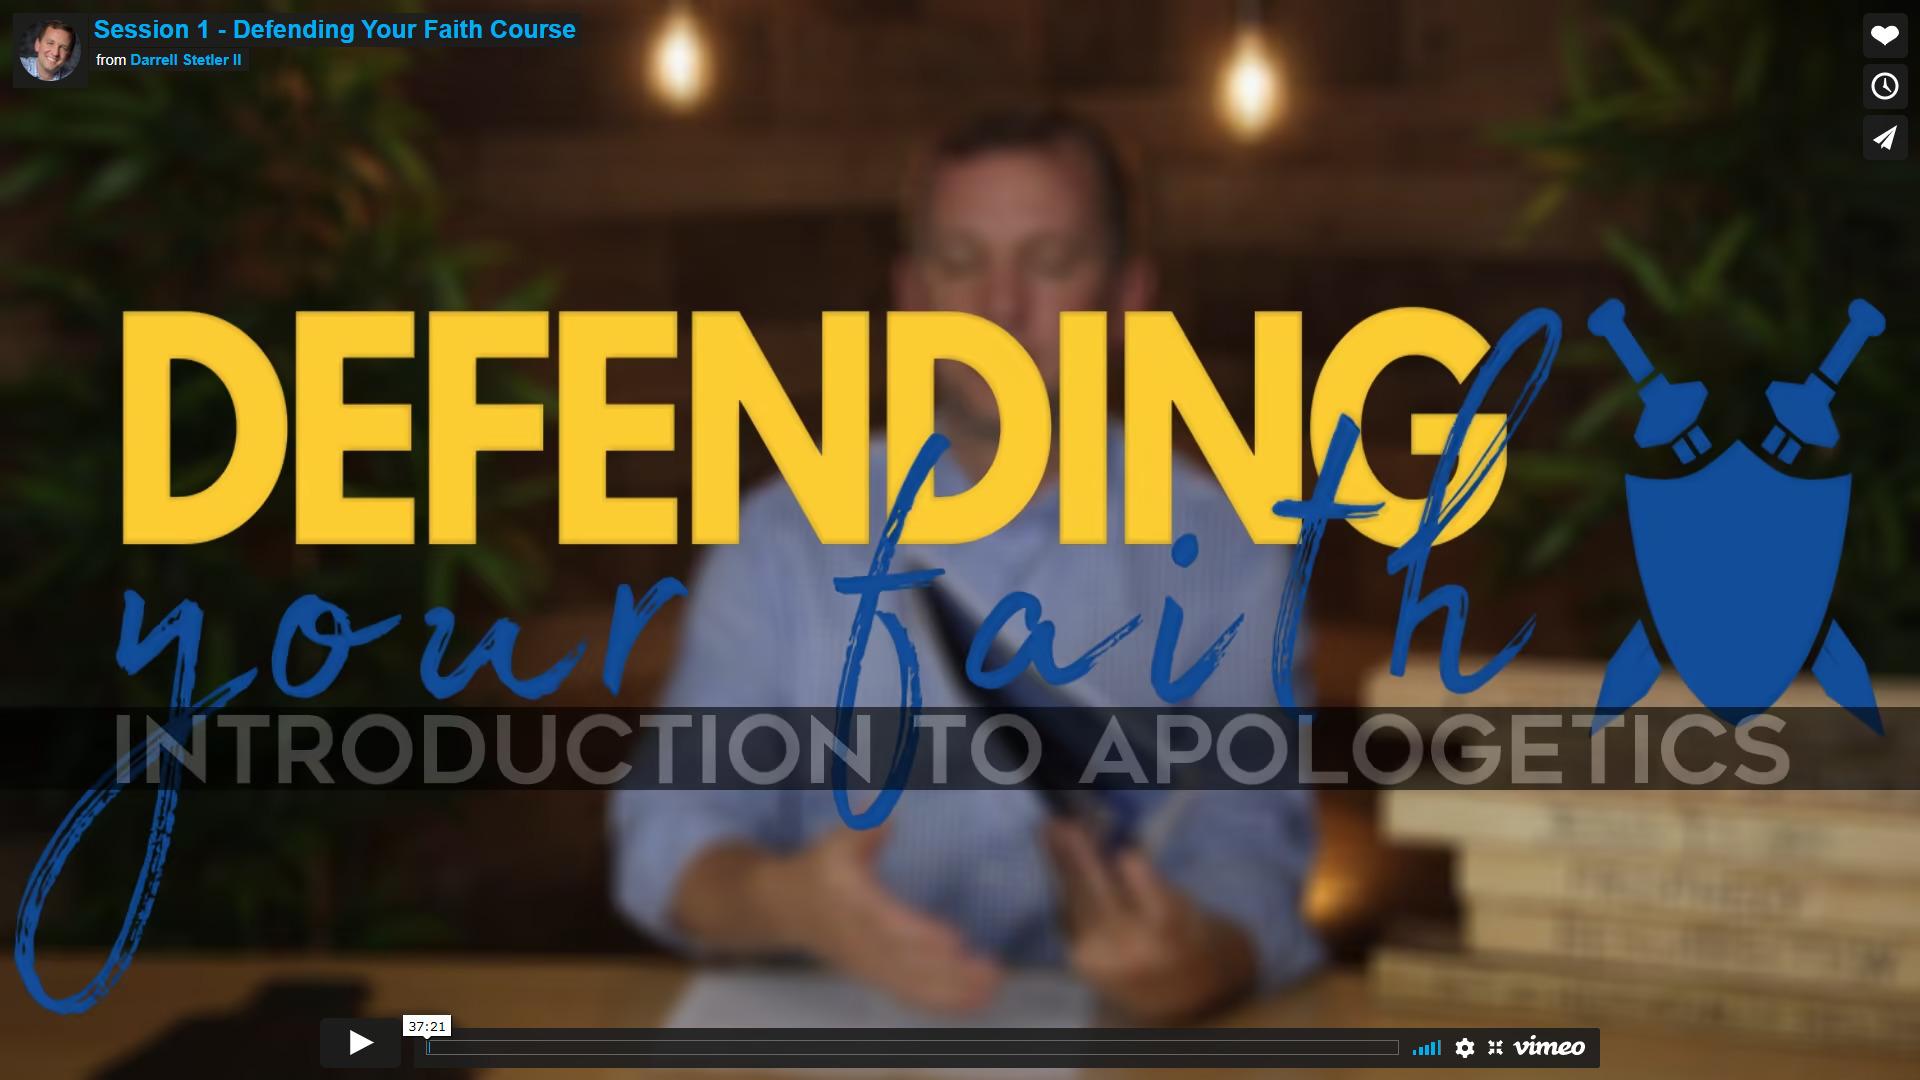 Defending Your Faith Video Course